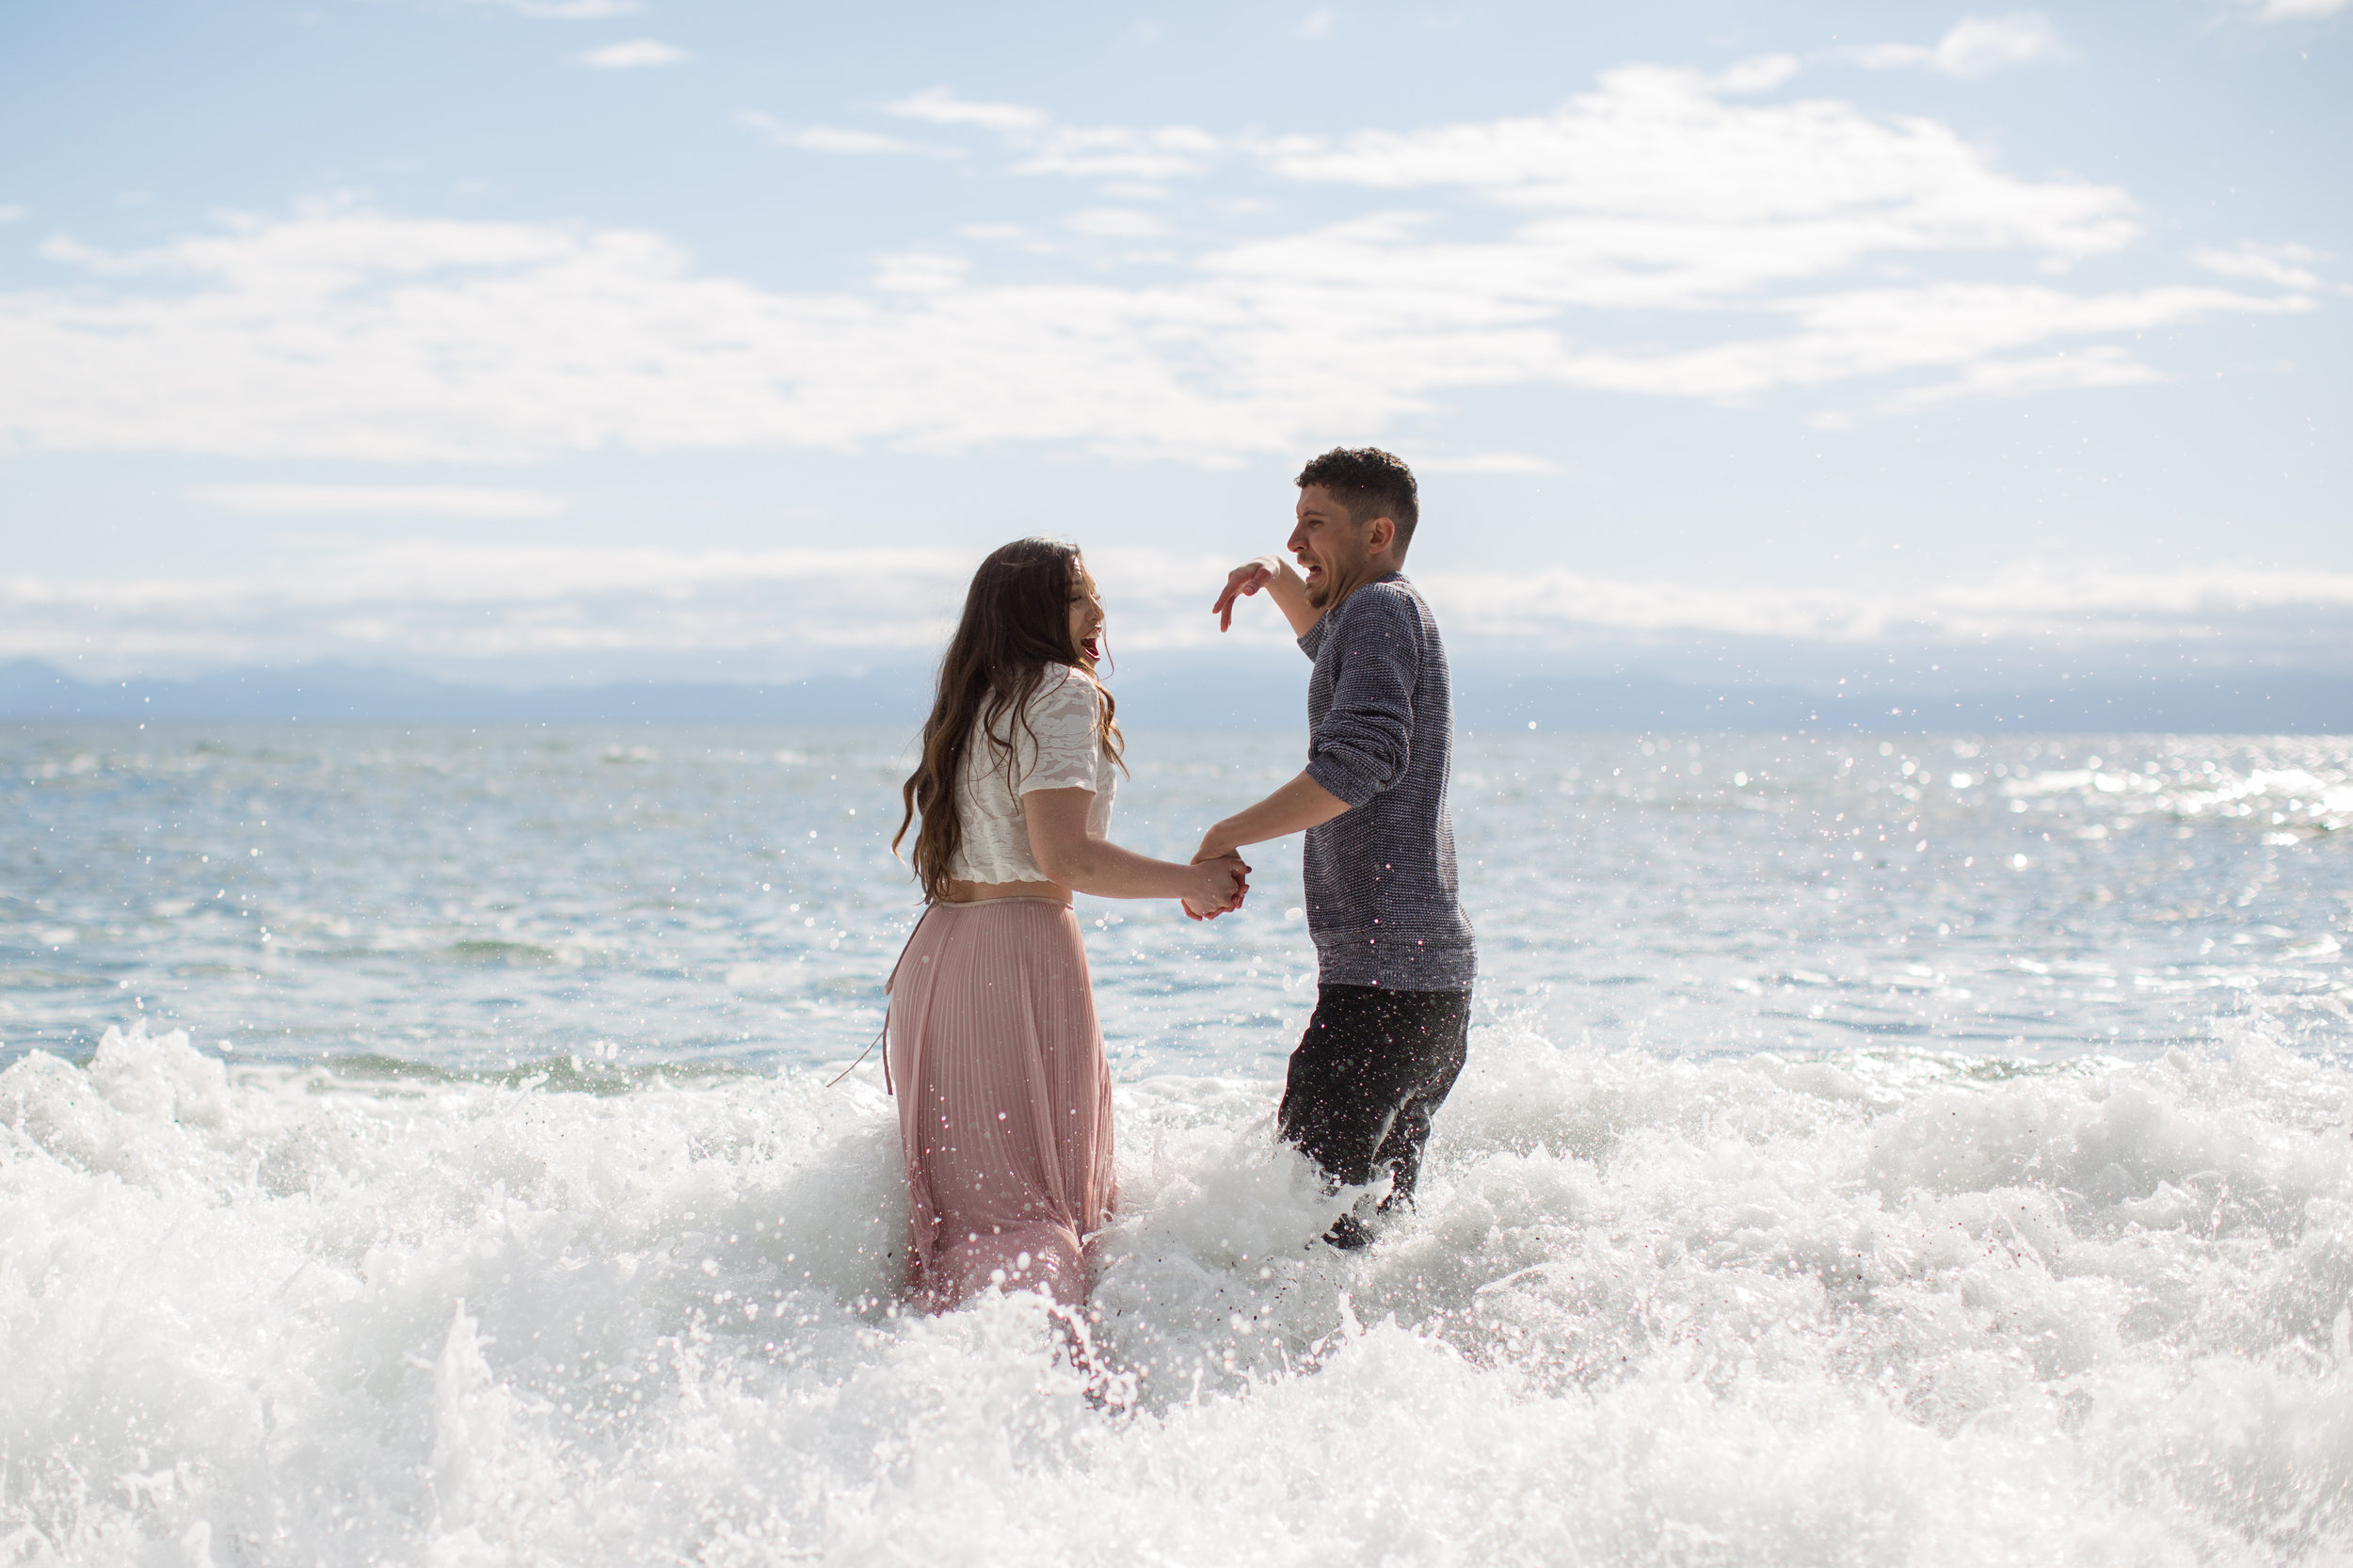 Adam-Ziorio-Photography-Victoria-BC-Epic-Engagement.jpg